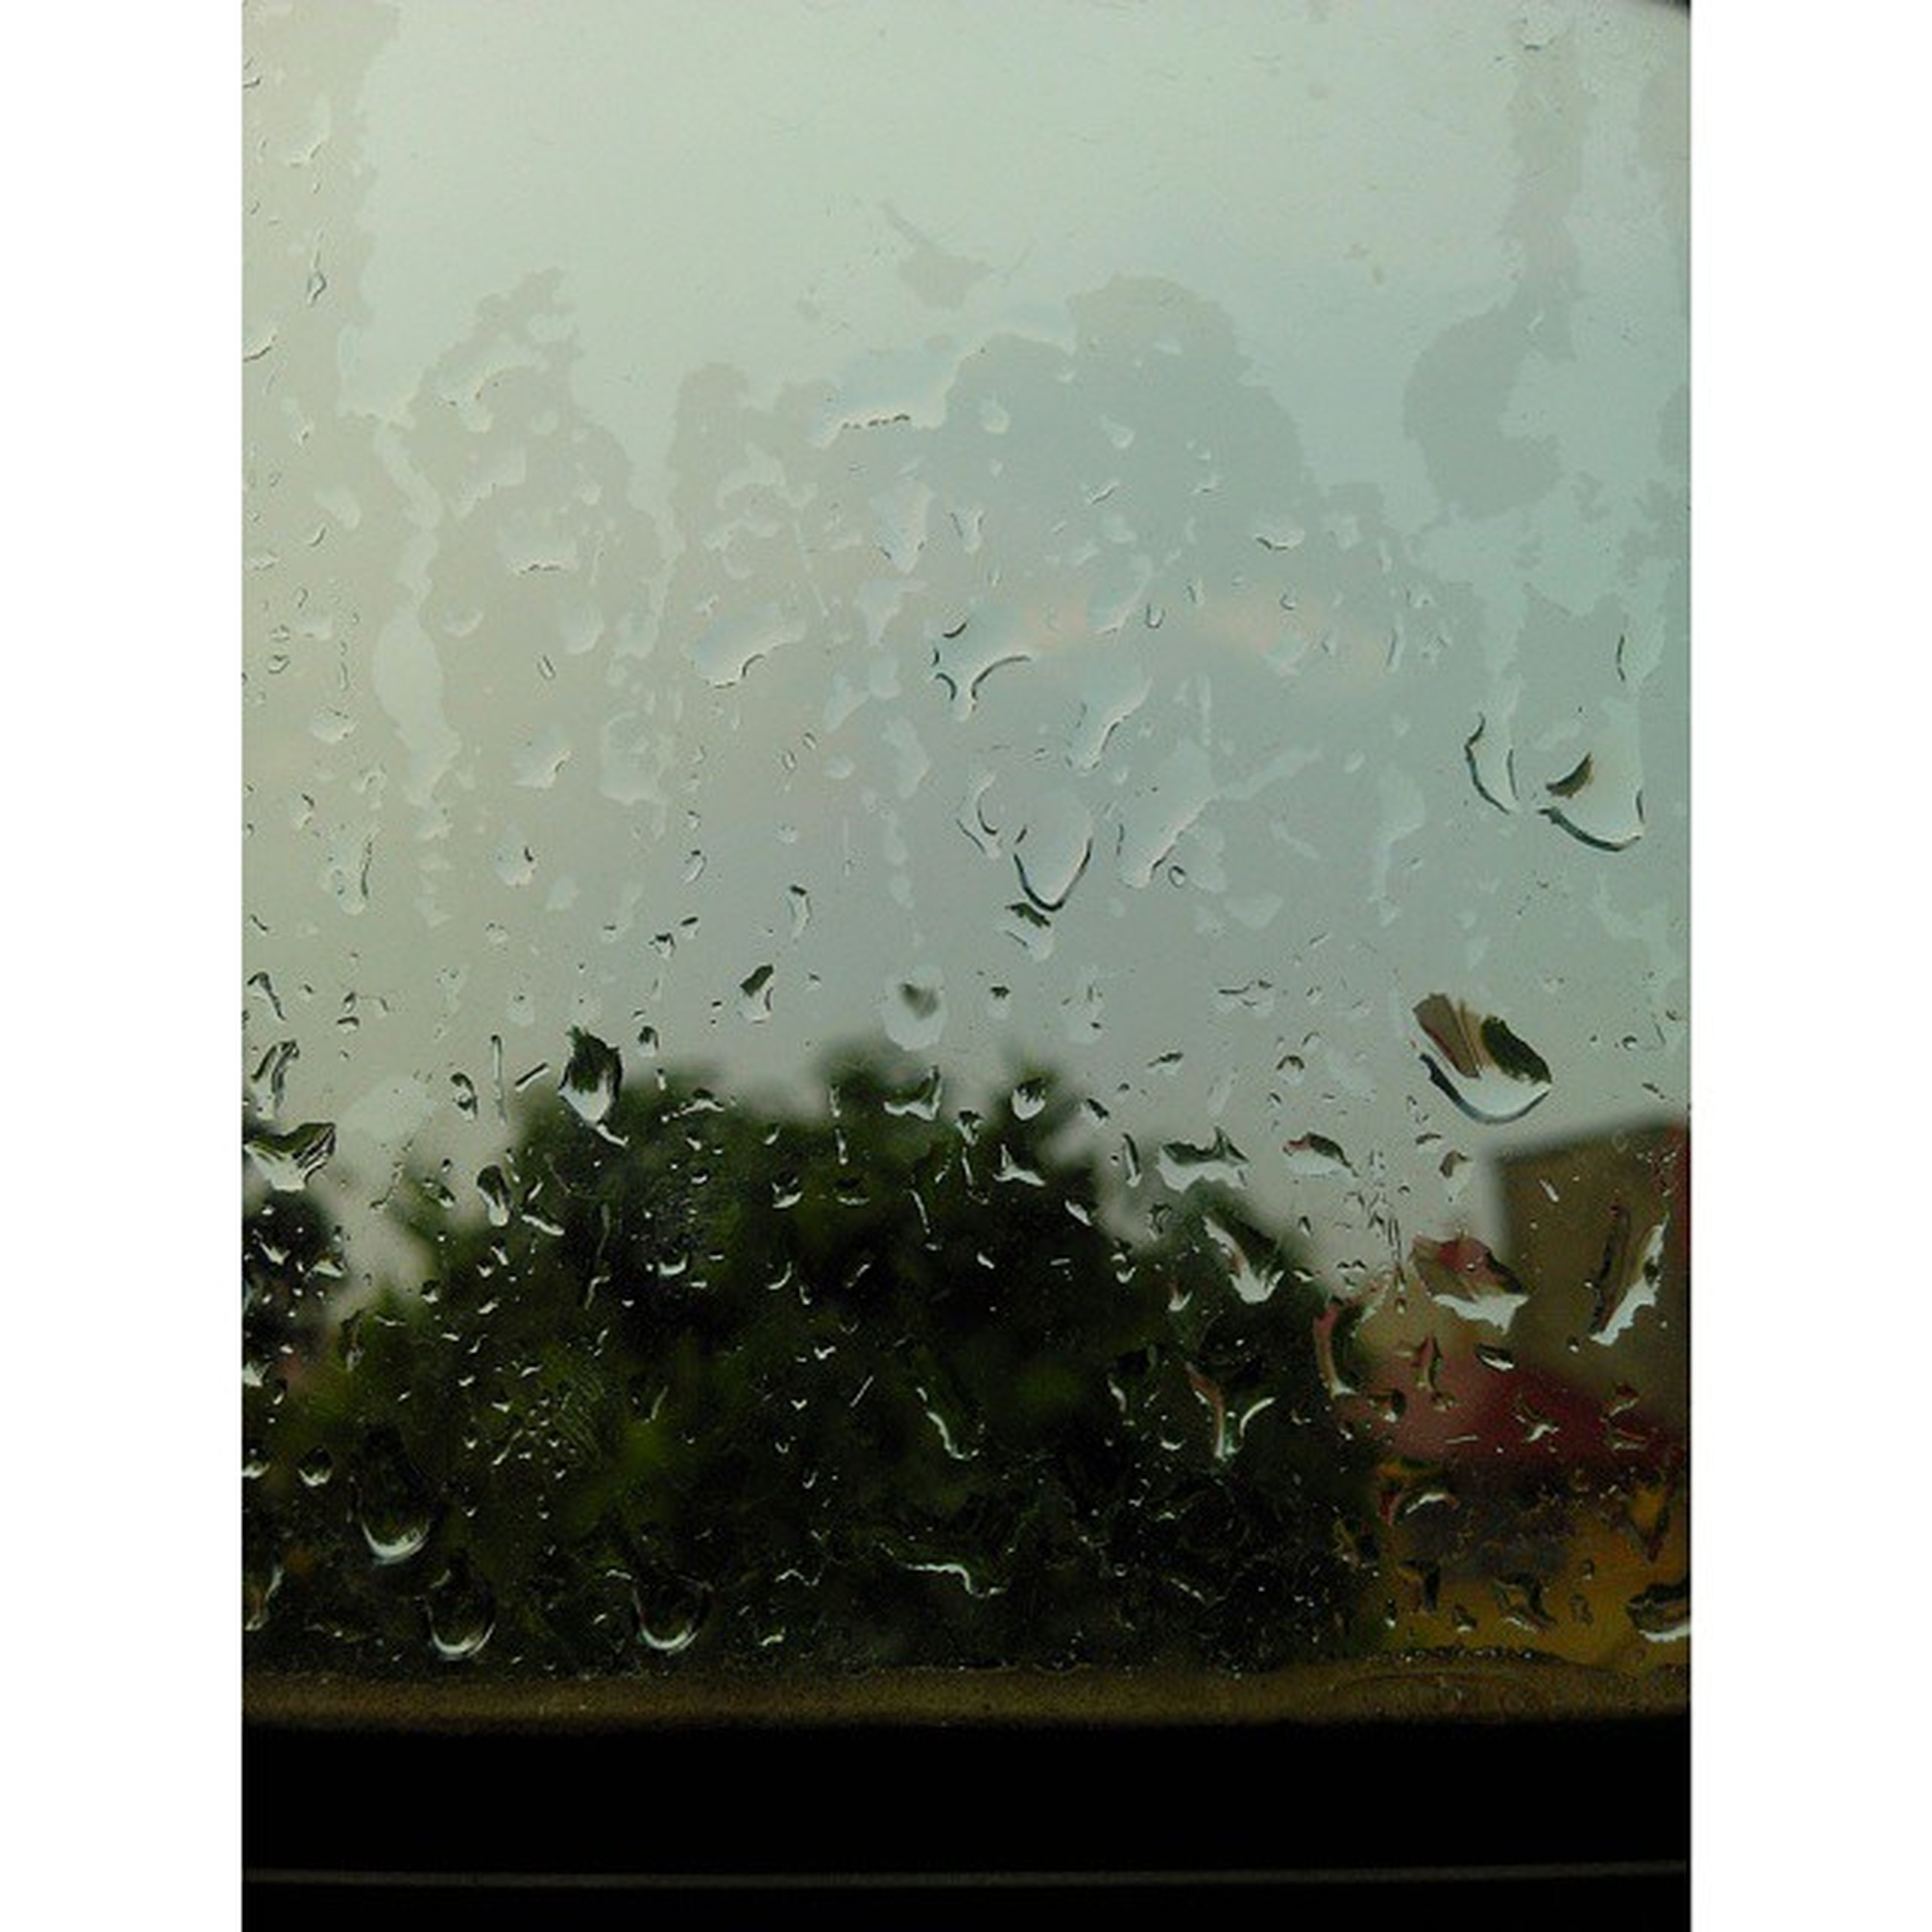 drop, window, transparent, glass - material, wet, indoors, water, rain, glass, raindrop, season, weather, looking through window, vehicle interior, car, close-up, full frame, backgrounds, water drop, sky